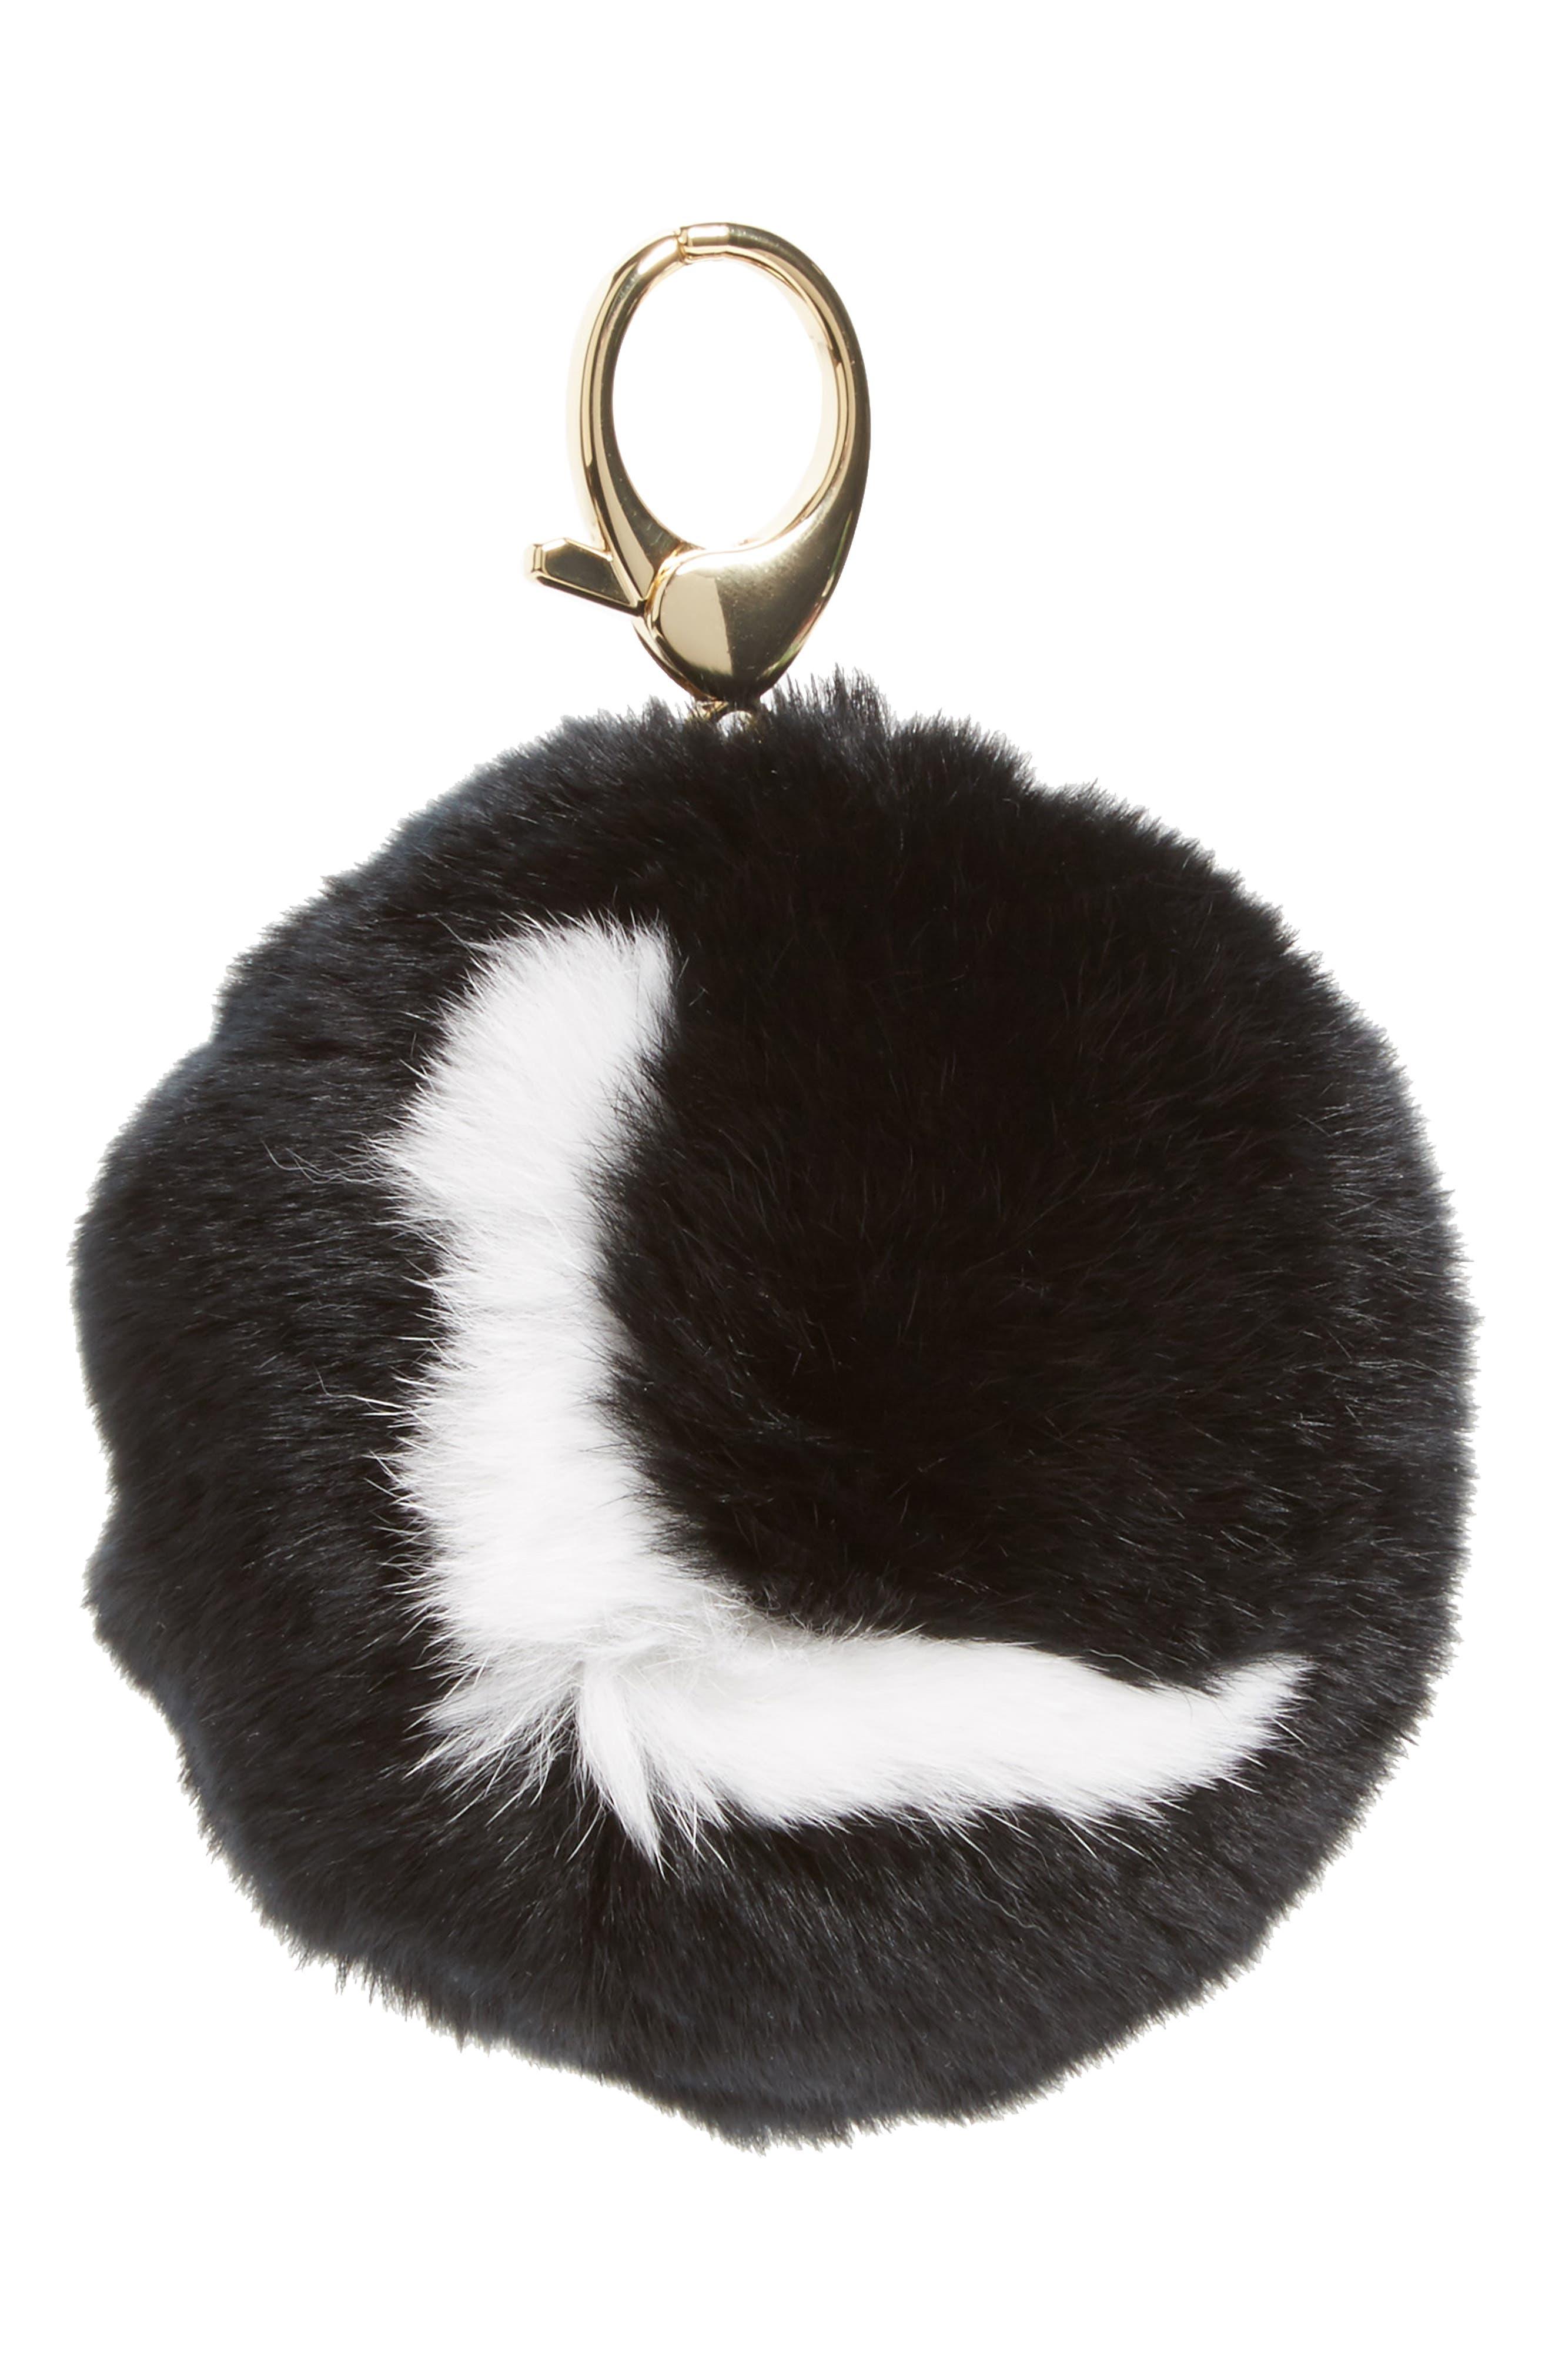 REBECCA MINKOFF,                             Genuine Rabbit Fur Initial Pom Bag Charm,                             Main thumbnail 1, color,                             001